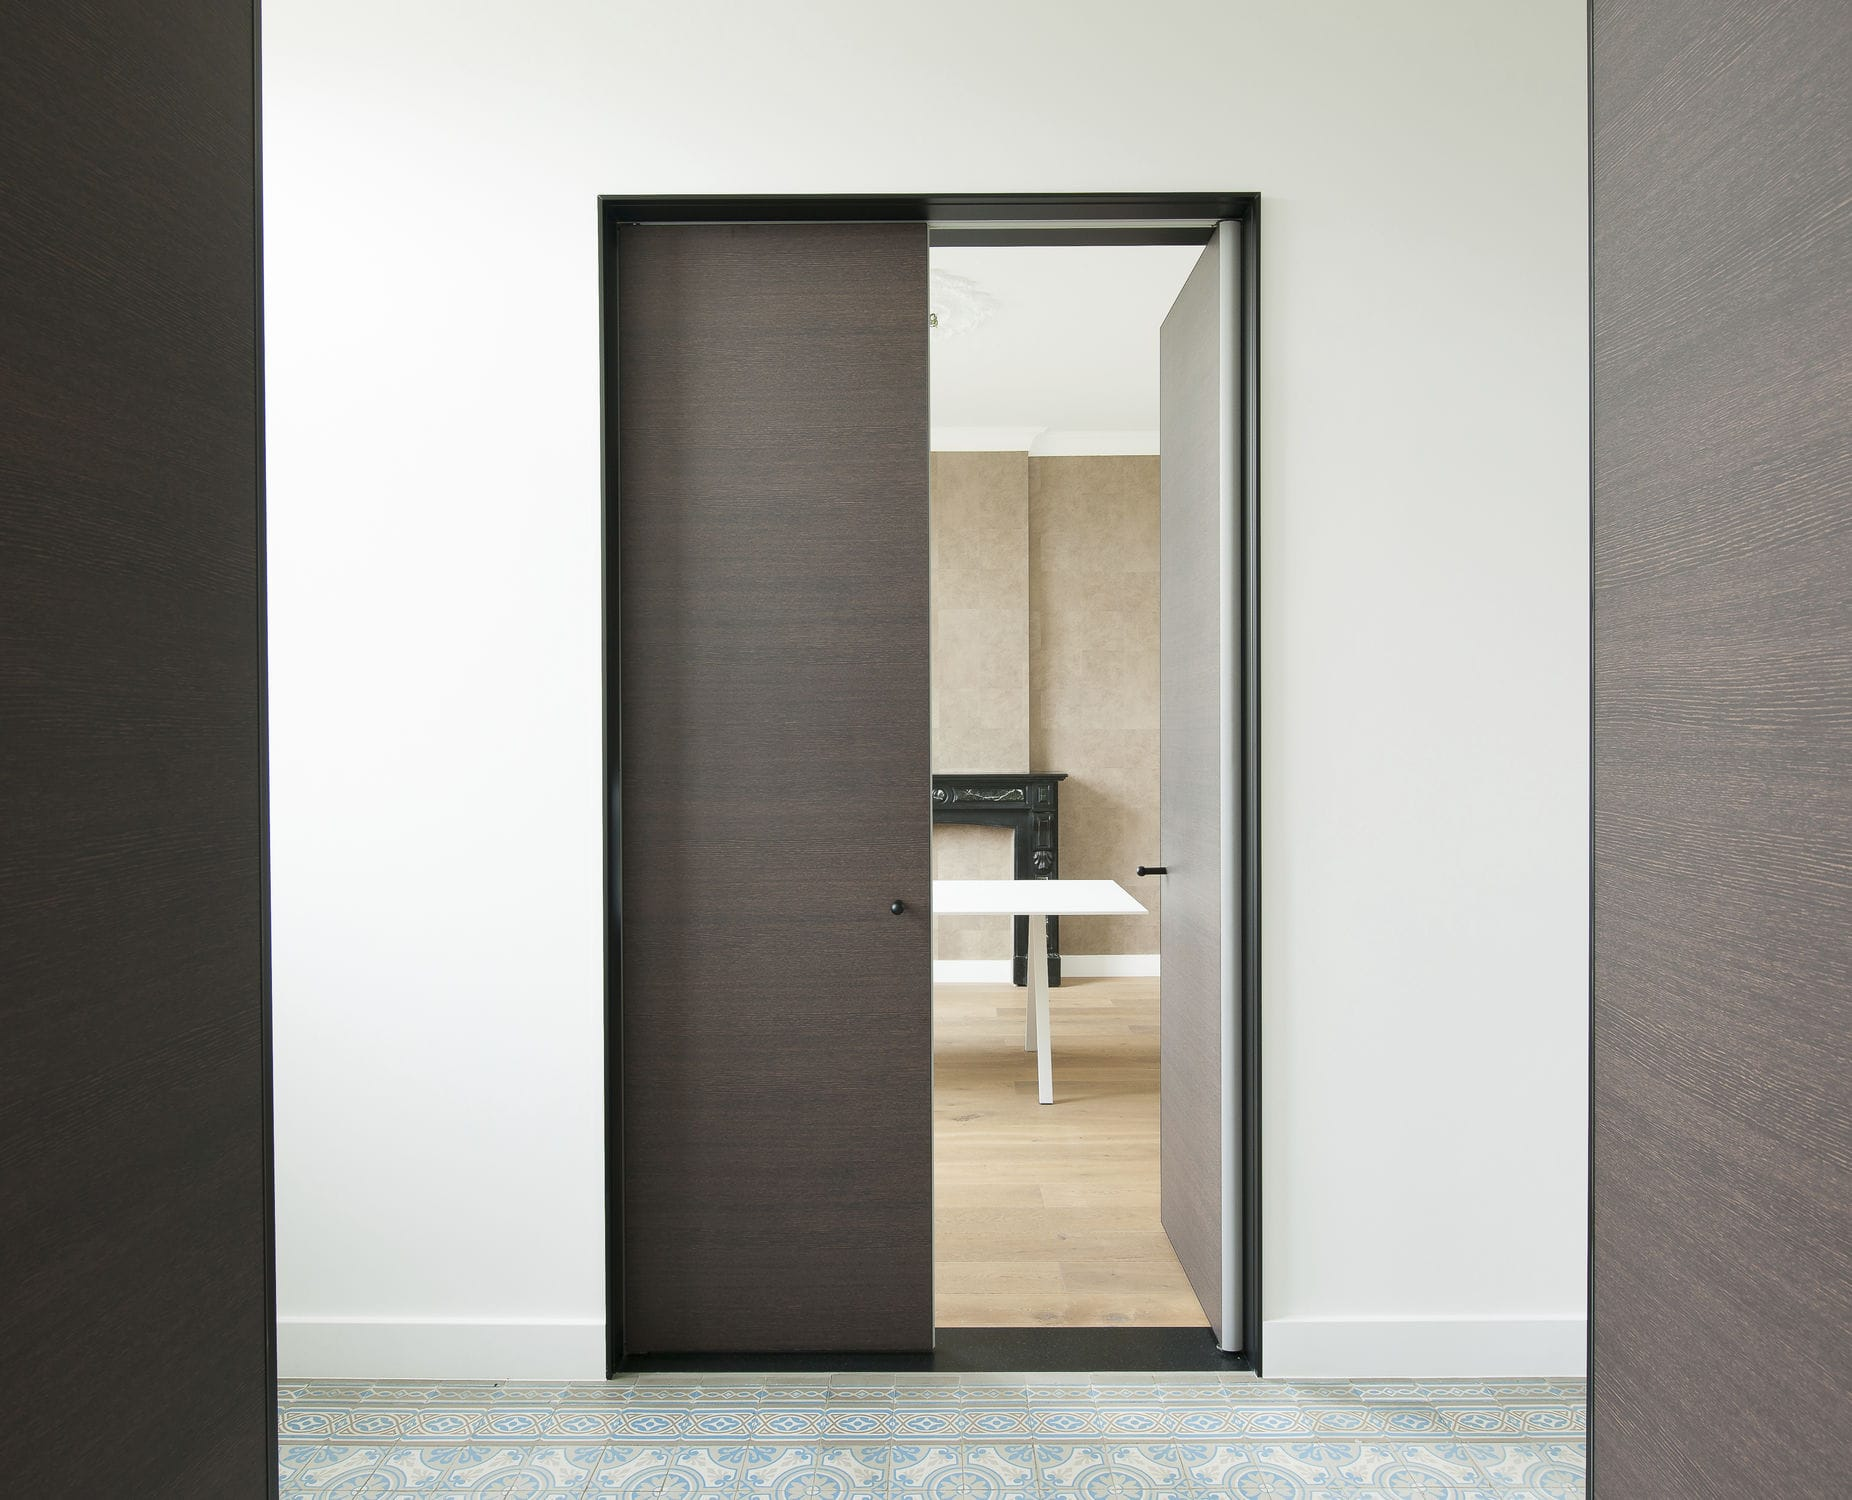 Anodized aluminum door frame - OBO-B - ANYWAY DOORS - Videos on